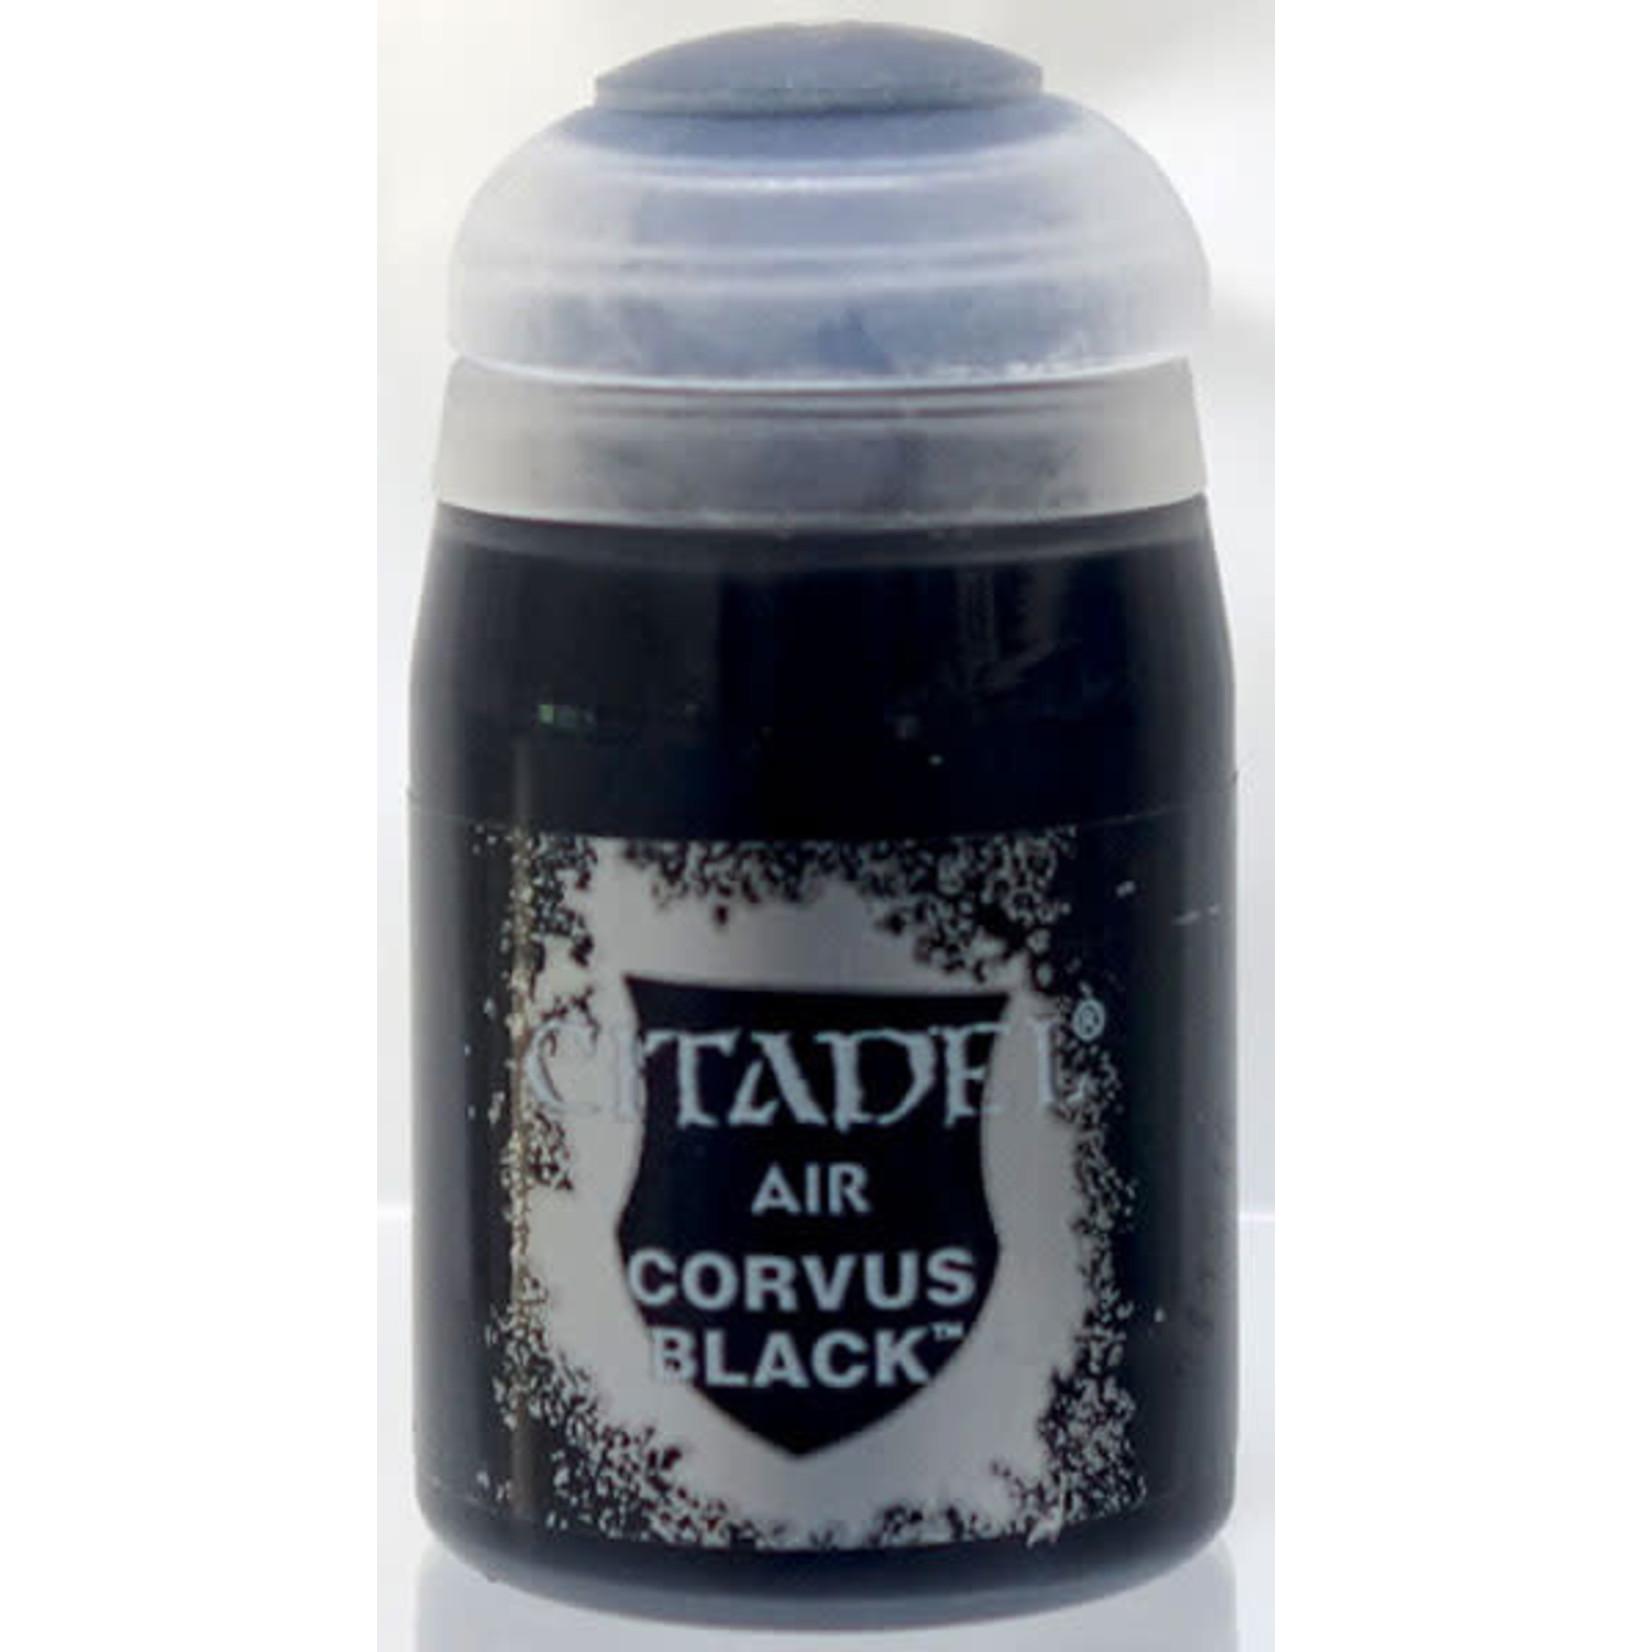 Games Workshop Citadel Paint: Corvus Black Air (24 ml)